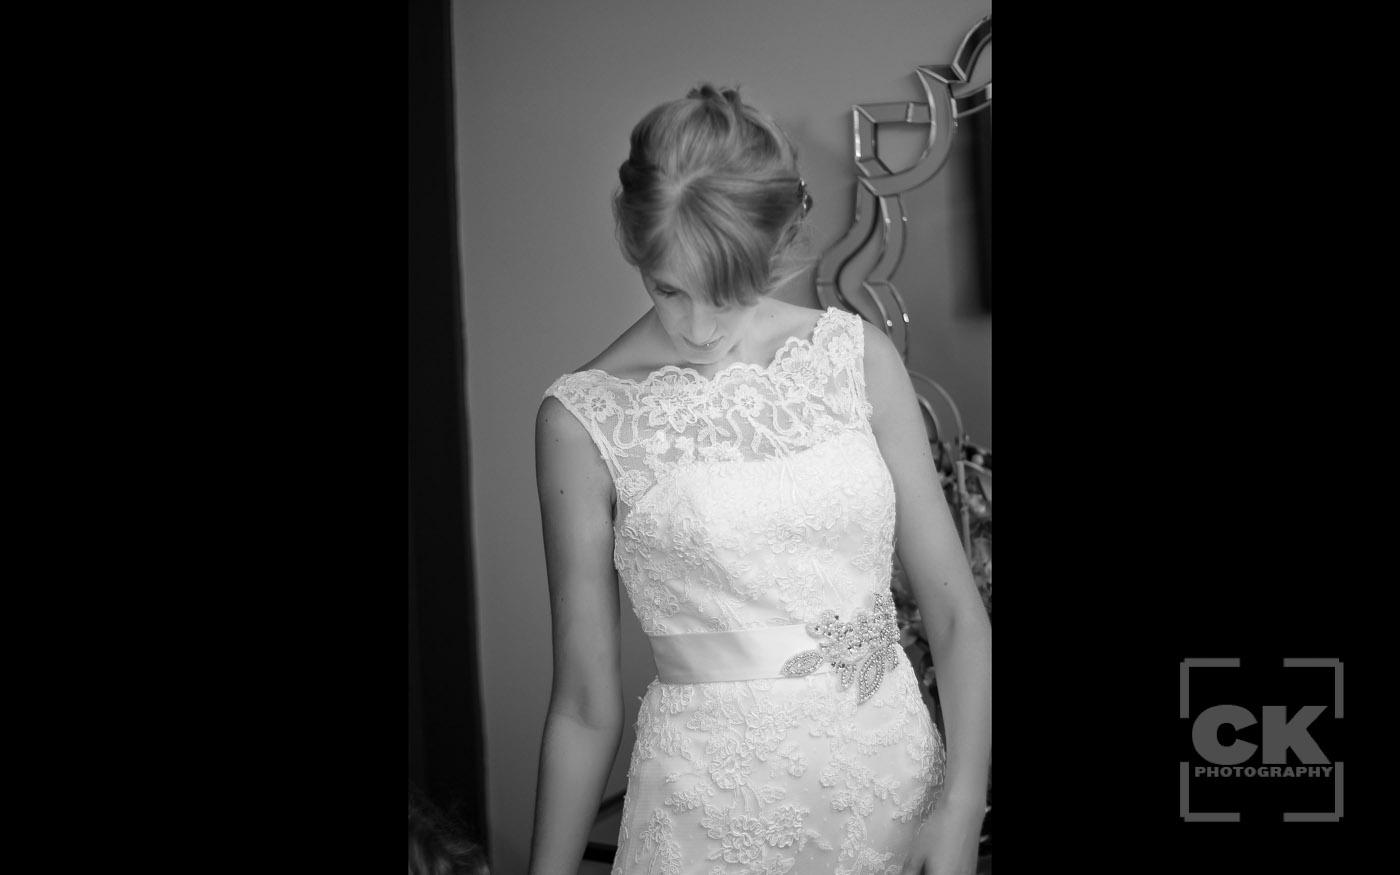 Chris Kryzanek Photography - beautiful Bride in dress